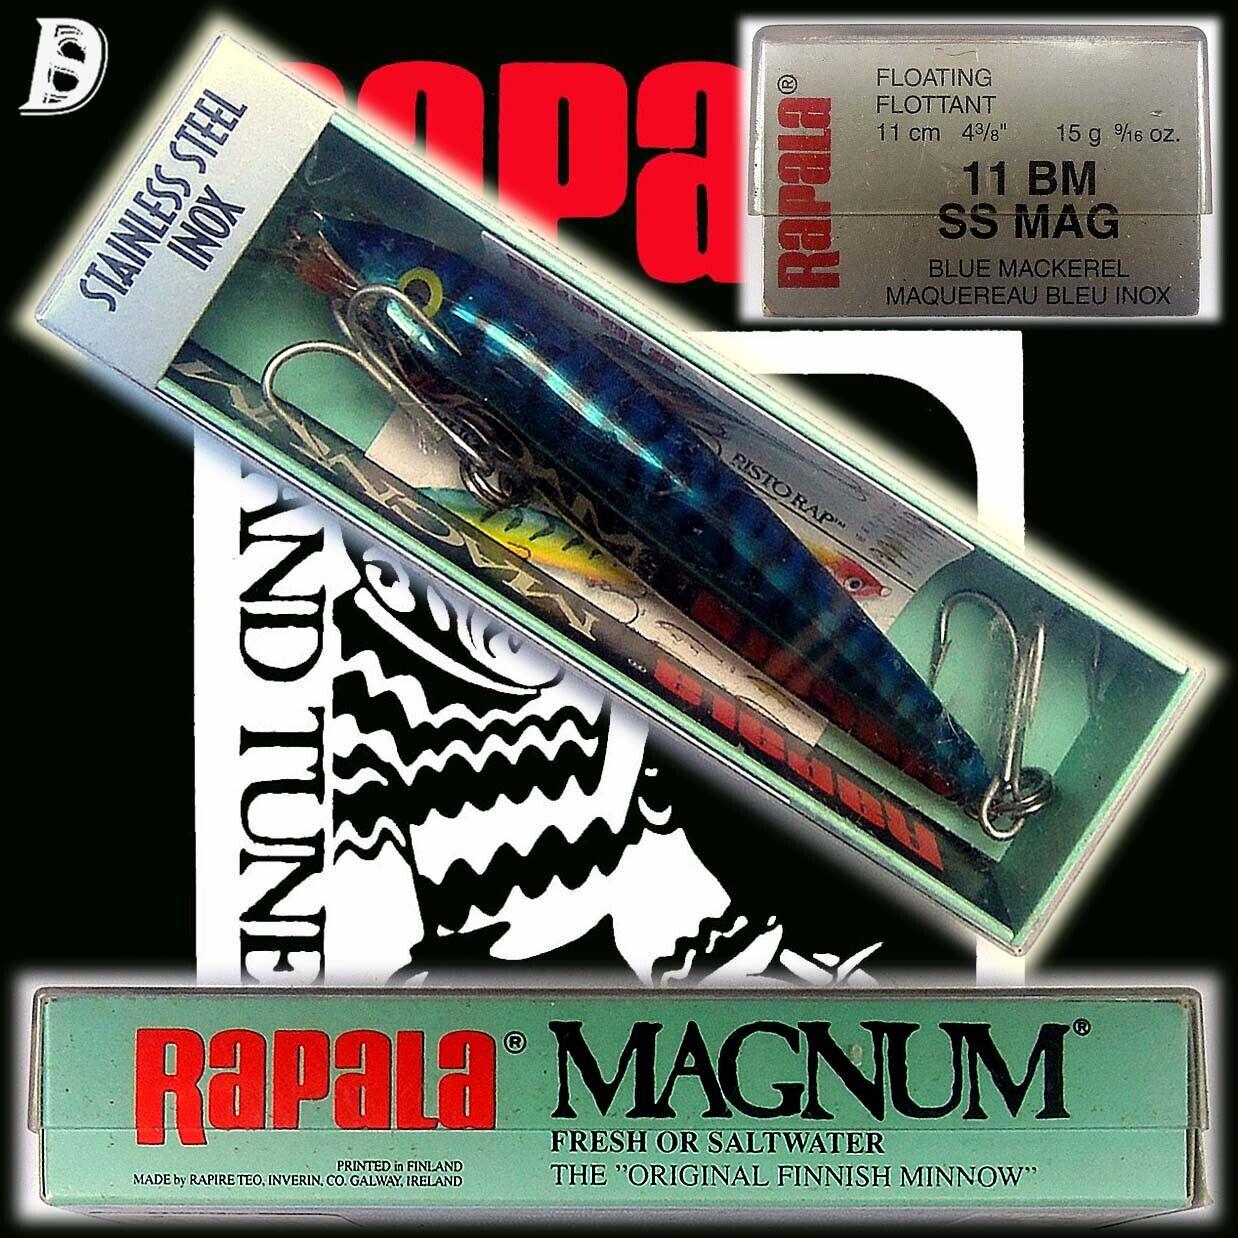 Vintage Rapala Magnum Floating Stainless Steel 11cm SS BM NiB wurde eingestellt